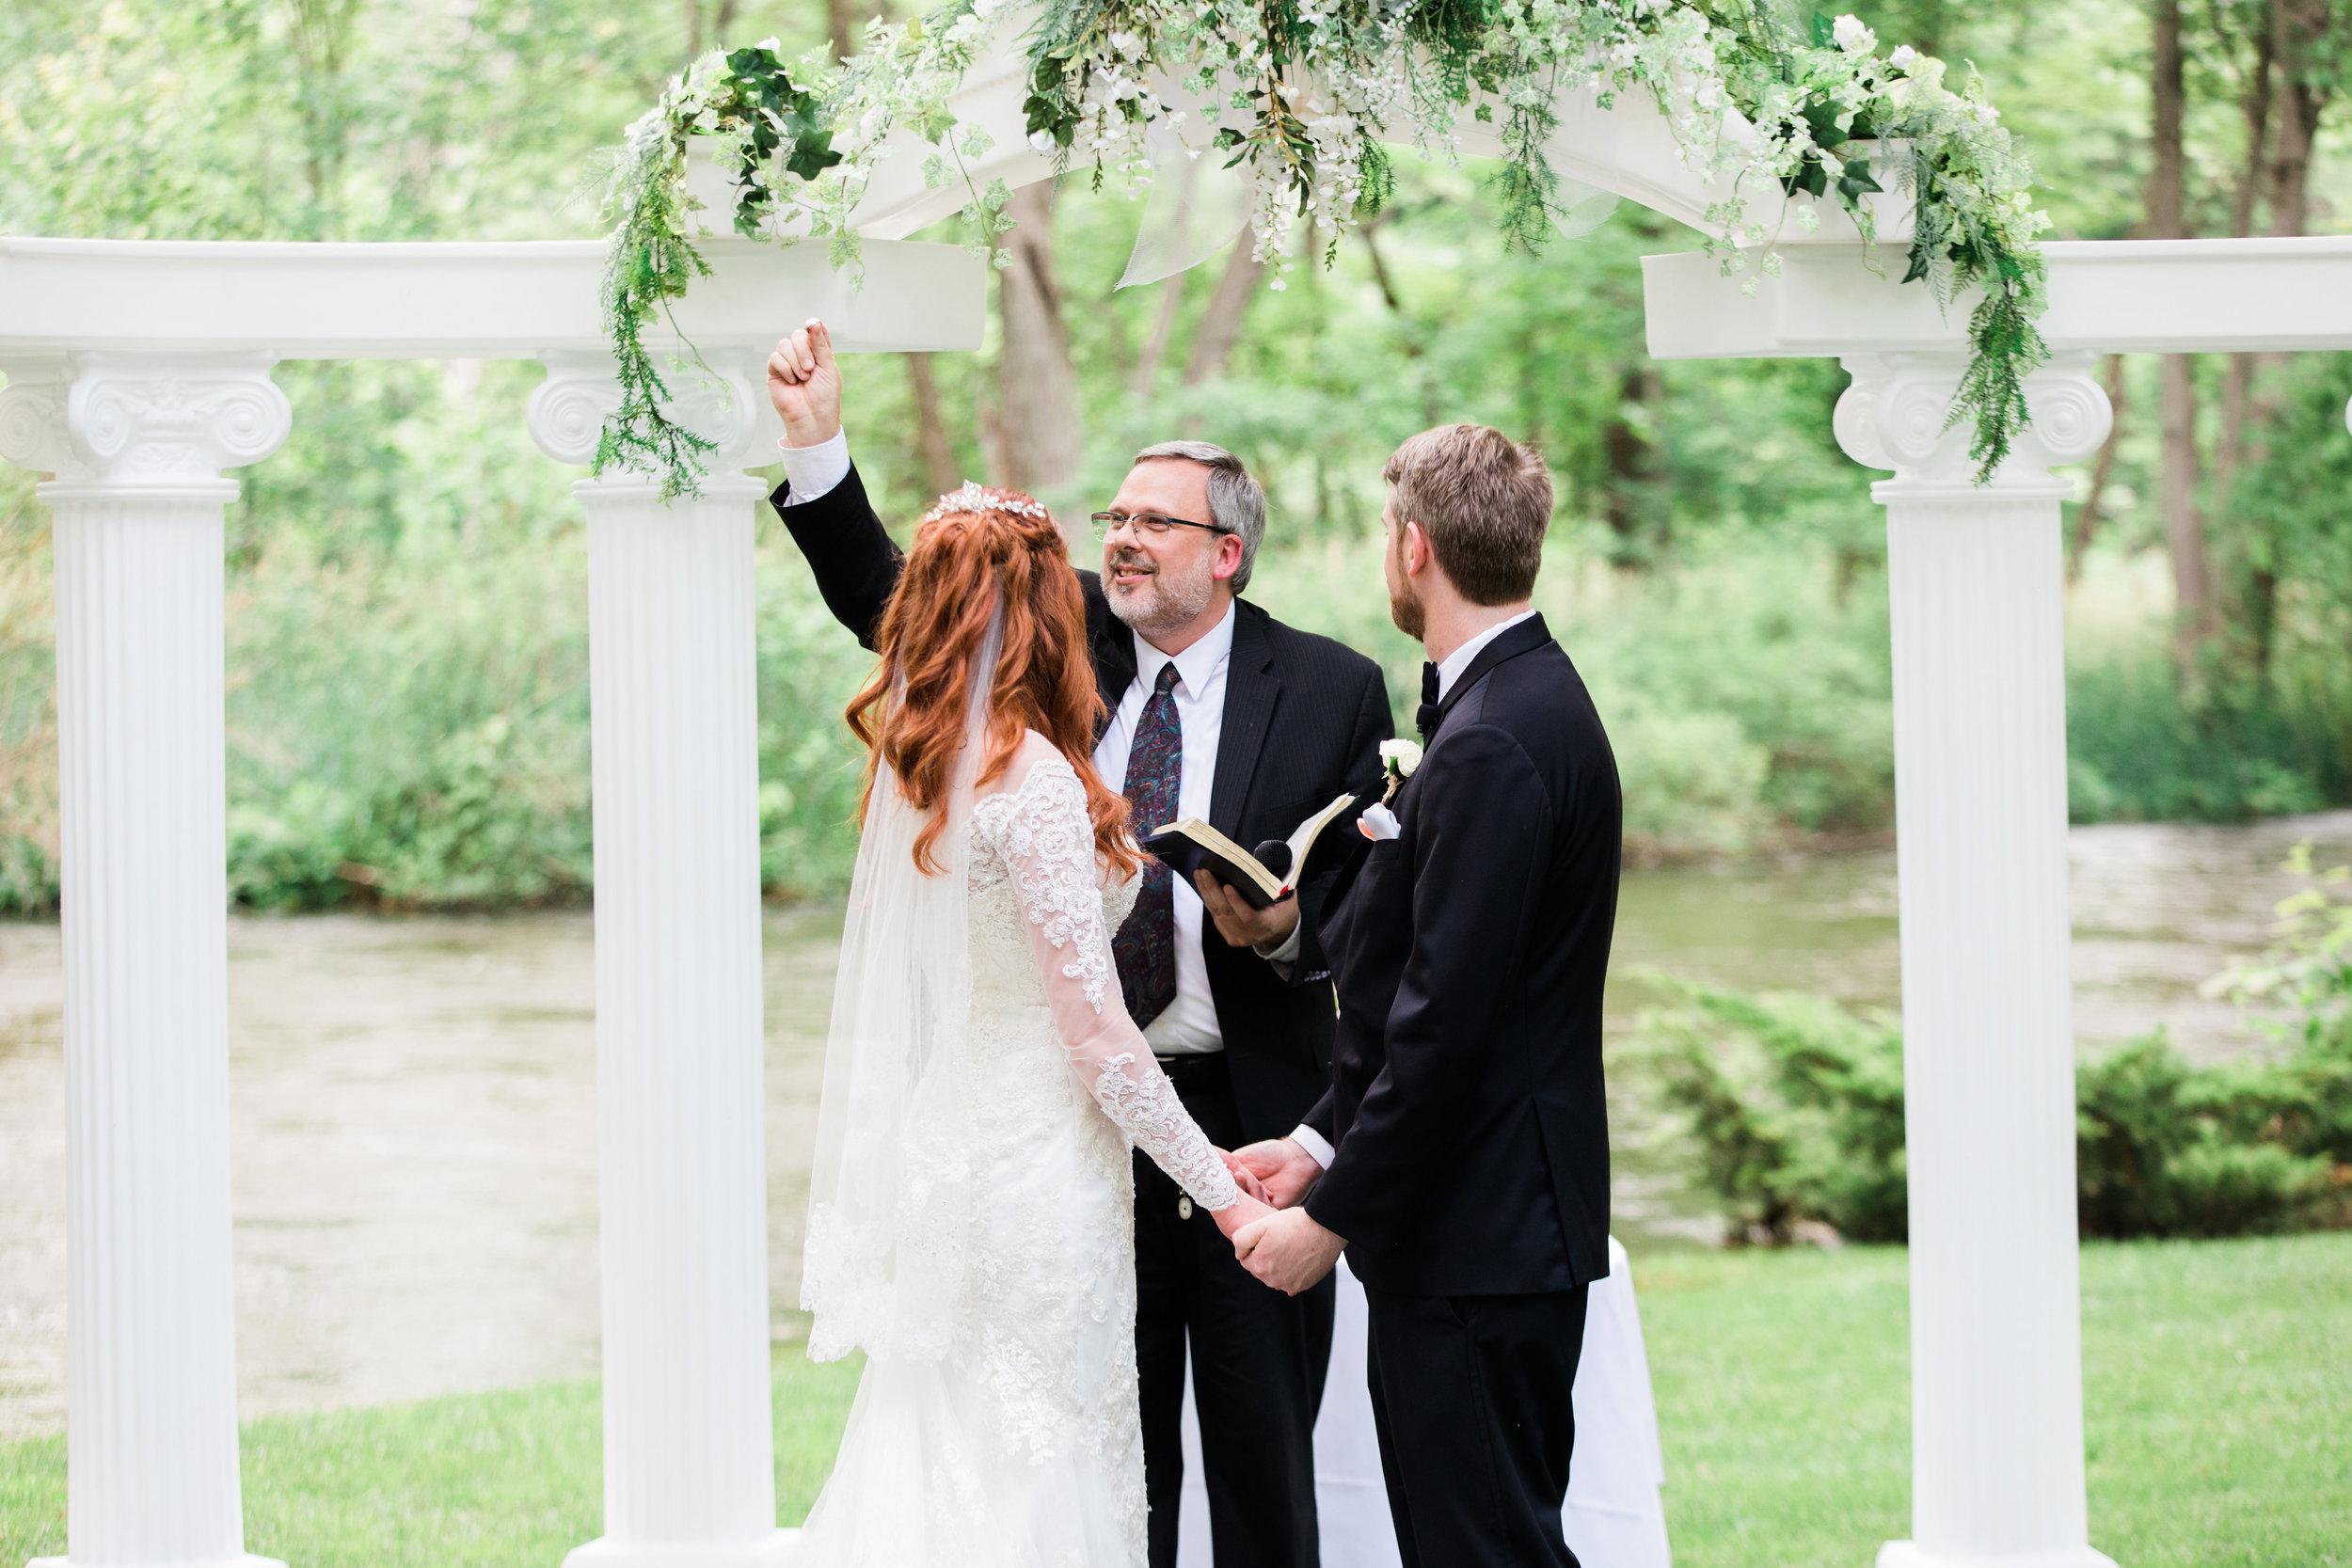 Conger+Wedding+Ceremony-79.jpg